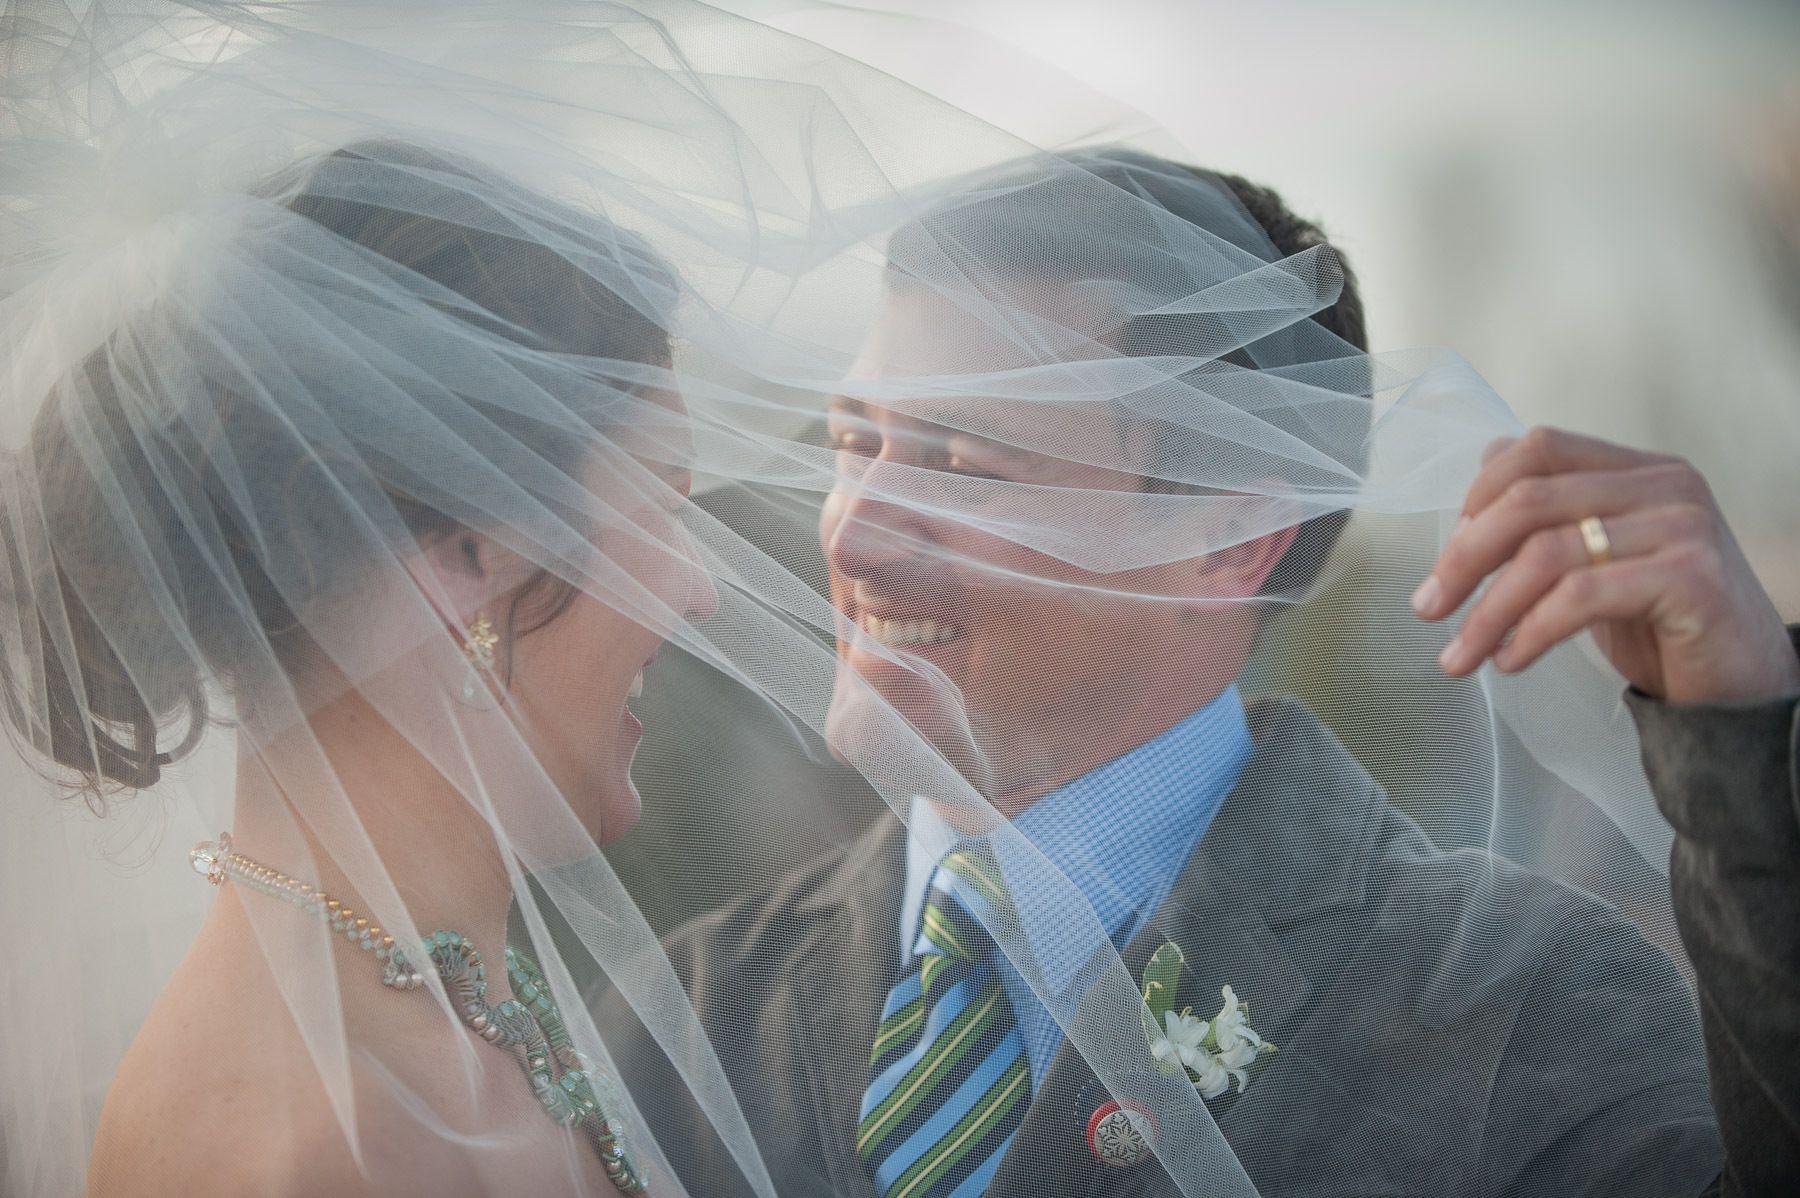 032415091153_1greenwood_wedding_final_354.jpg